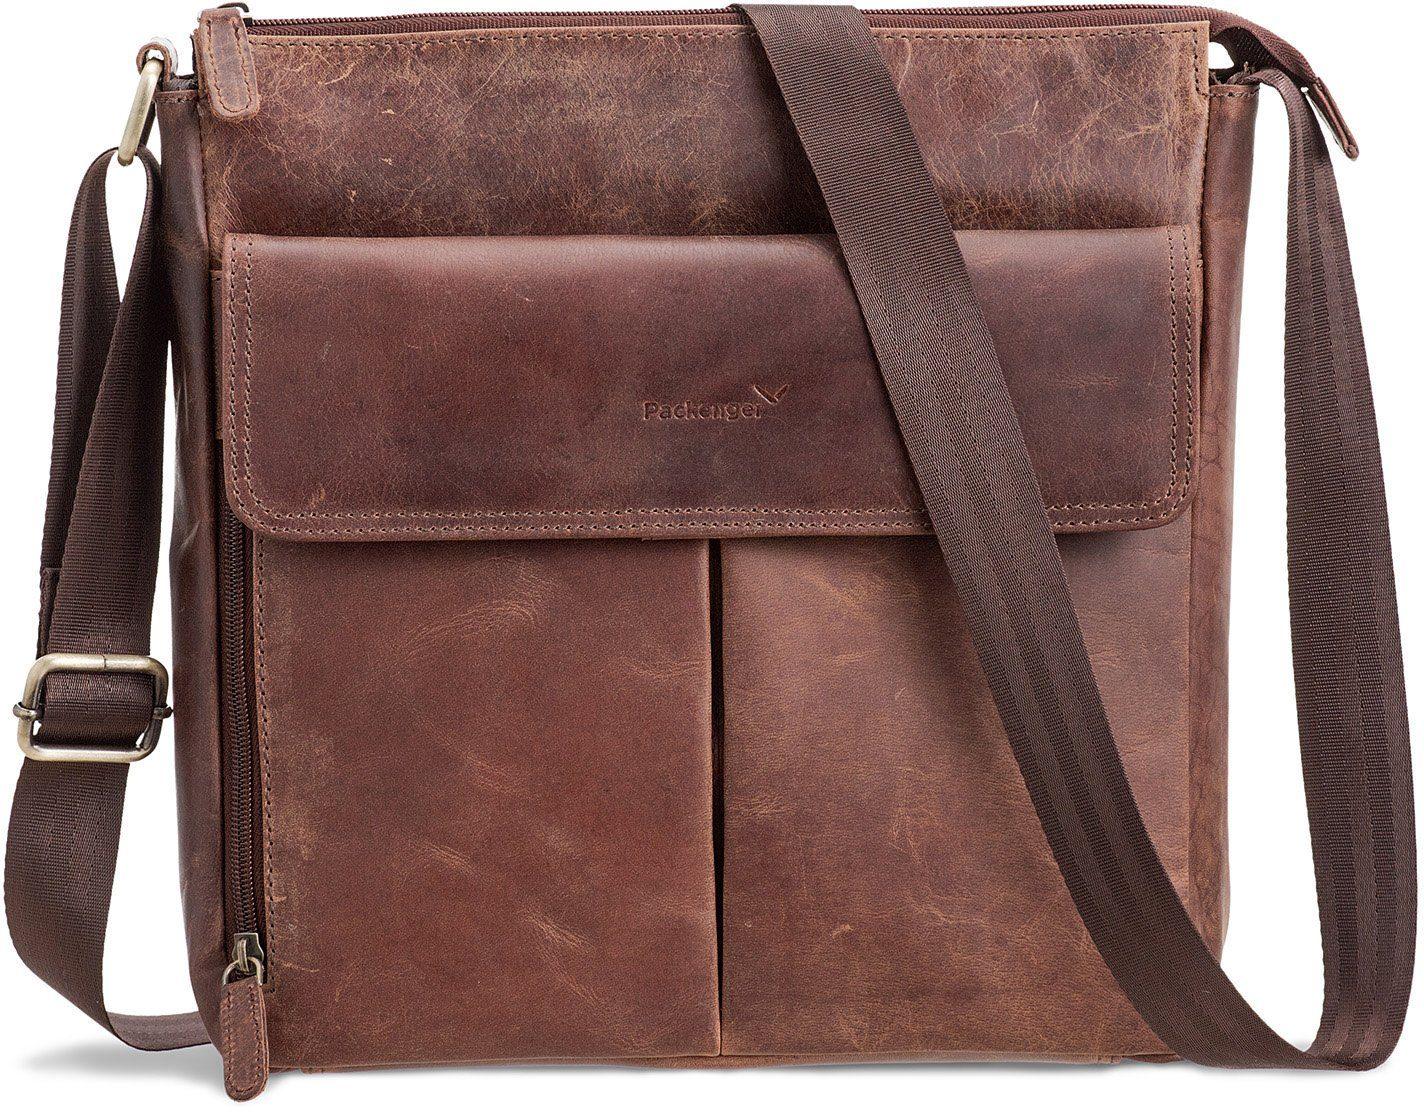 Packenger Messengerbag mit 12-Zoll Tablettasche, »Horik, vintage«